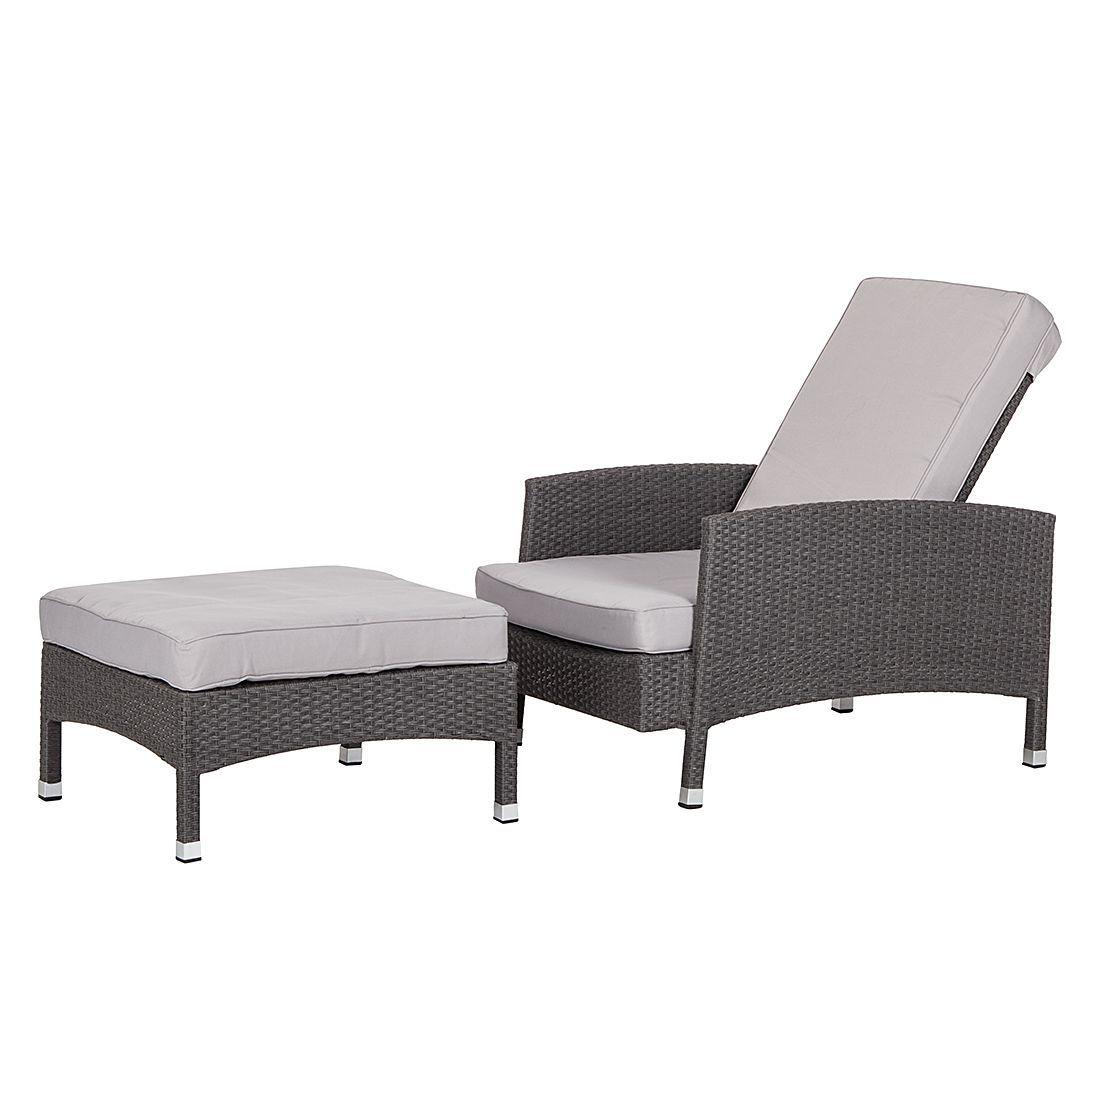 sessel set paradise lounge mit hocker polyrattan grau fredriks jetzt bestellen unter https. Black Bedroom Furniture Sets. Home Design Ideas